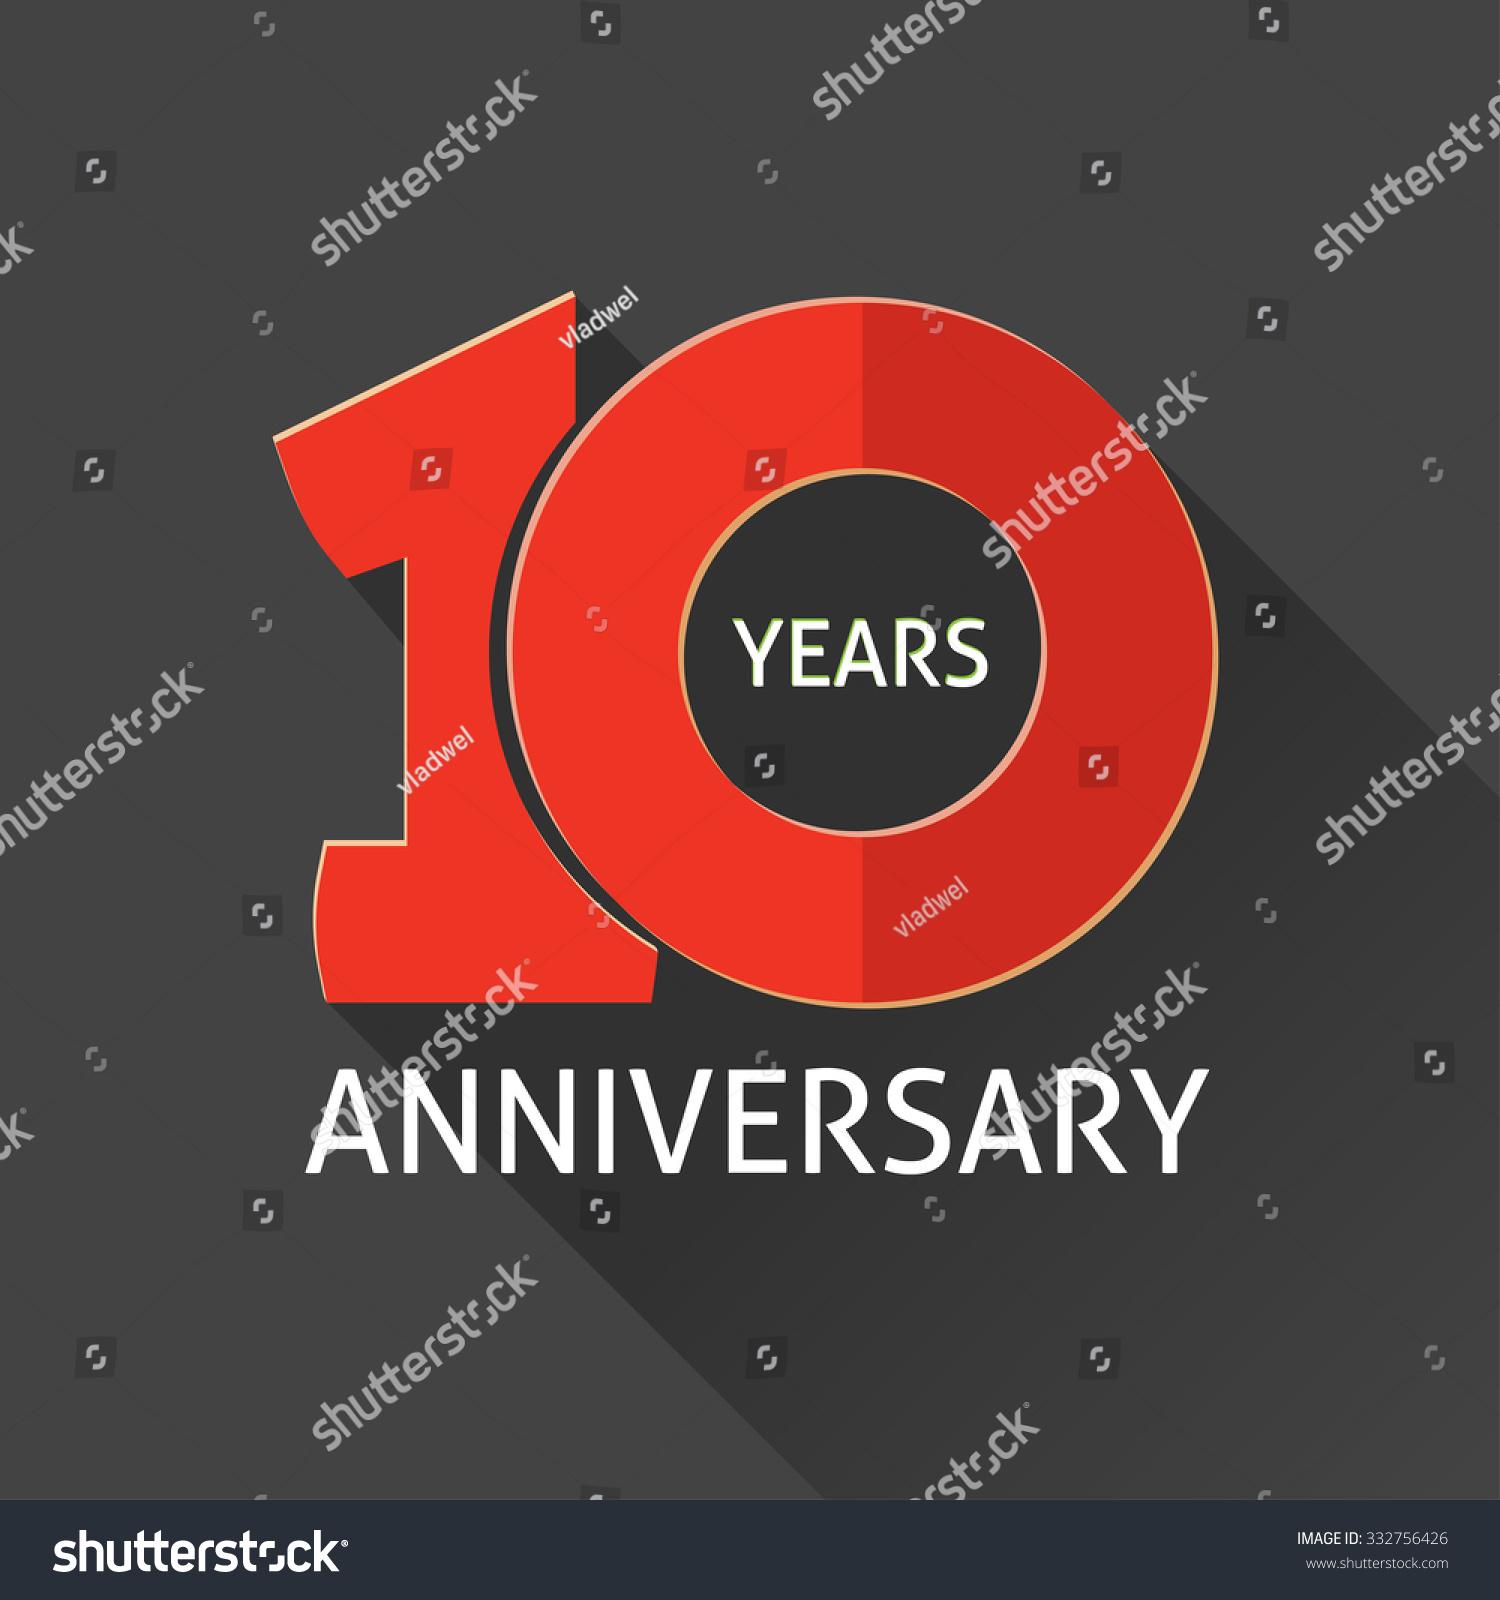 10th anniversary logo template shadow on のベクター画像素材